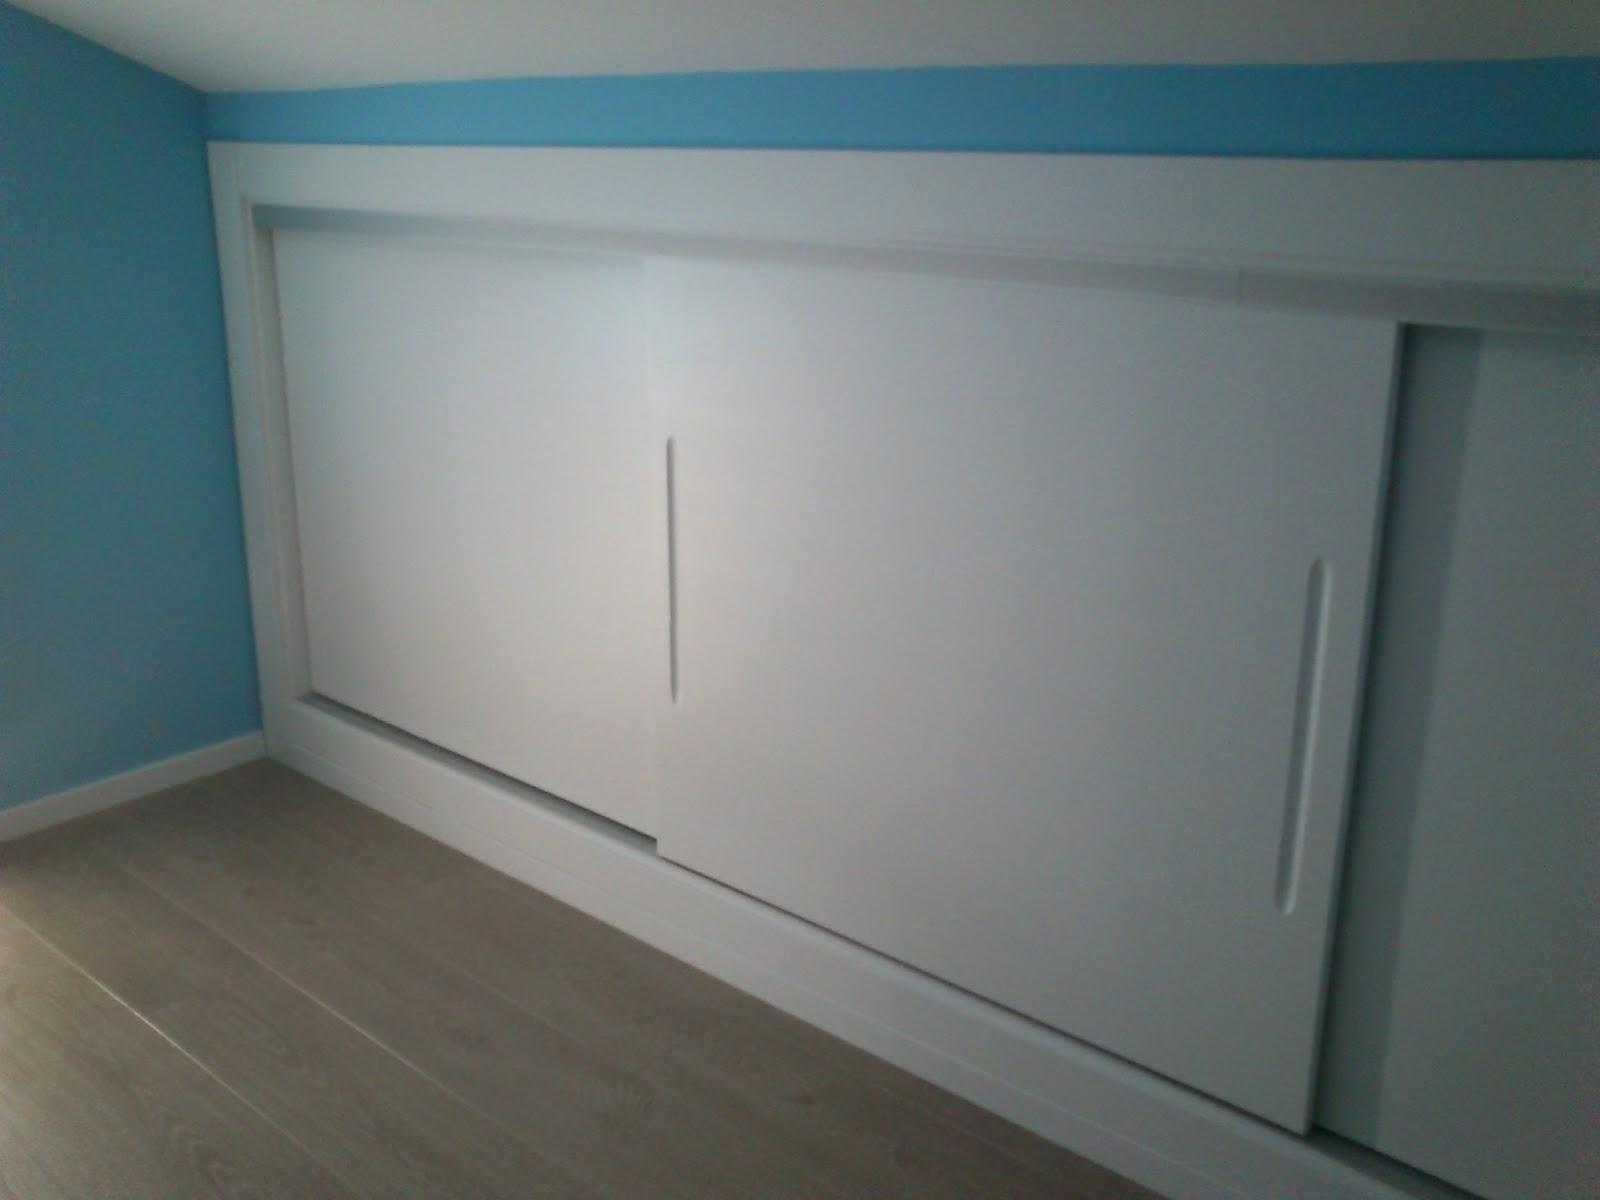 Carpinteria viosca roda frente de armario corredera apaisado - Frente armario corredera ...